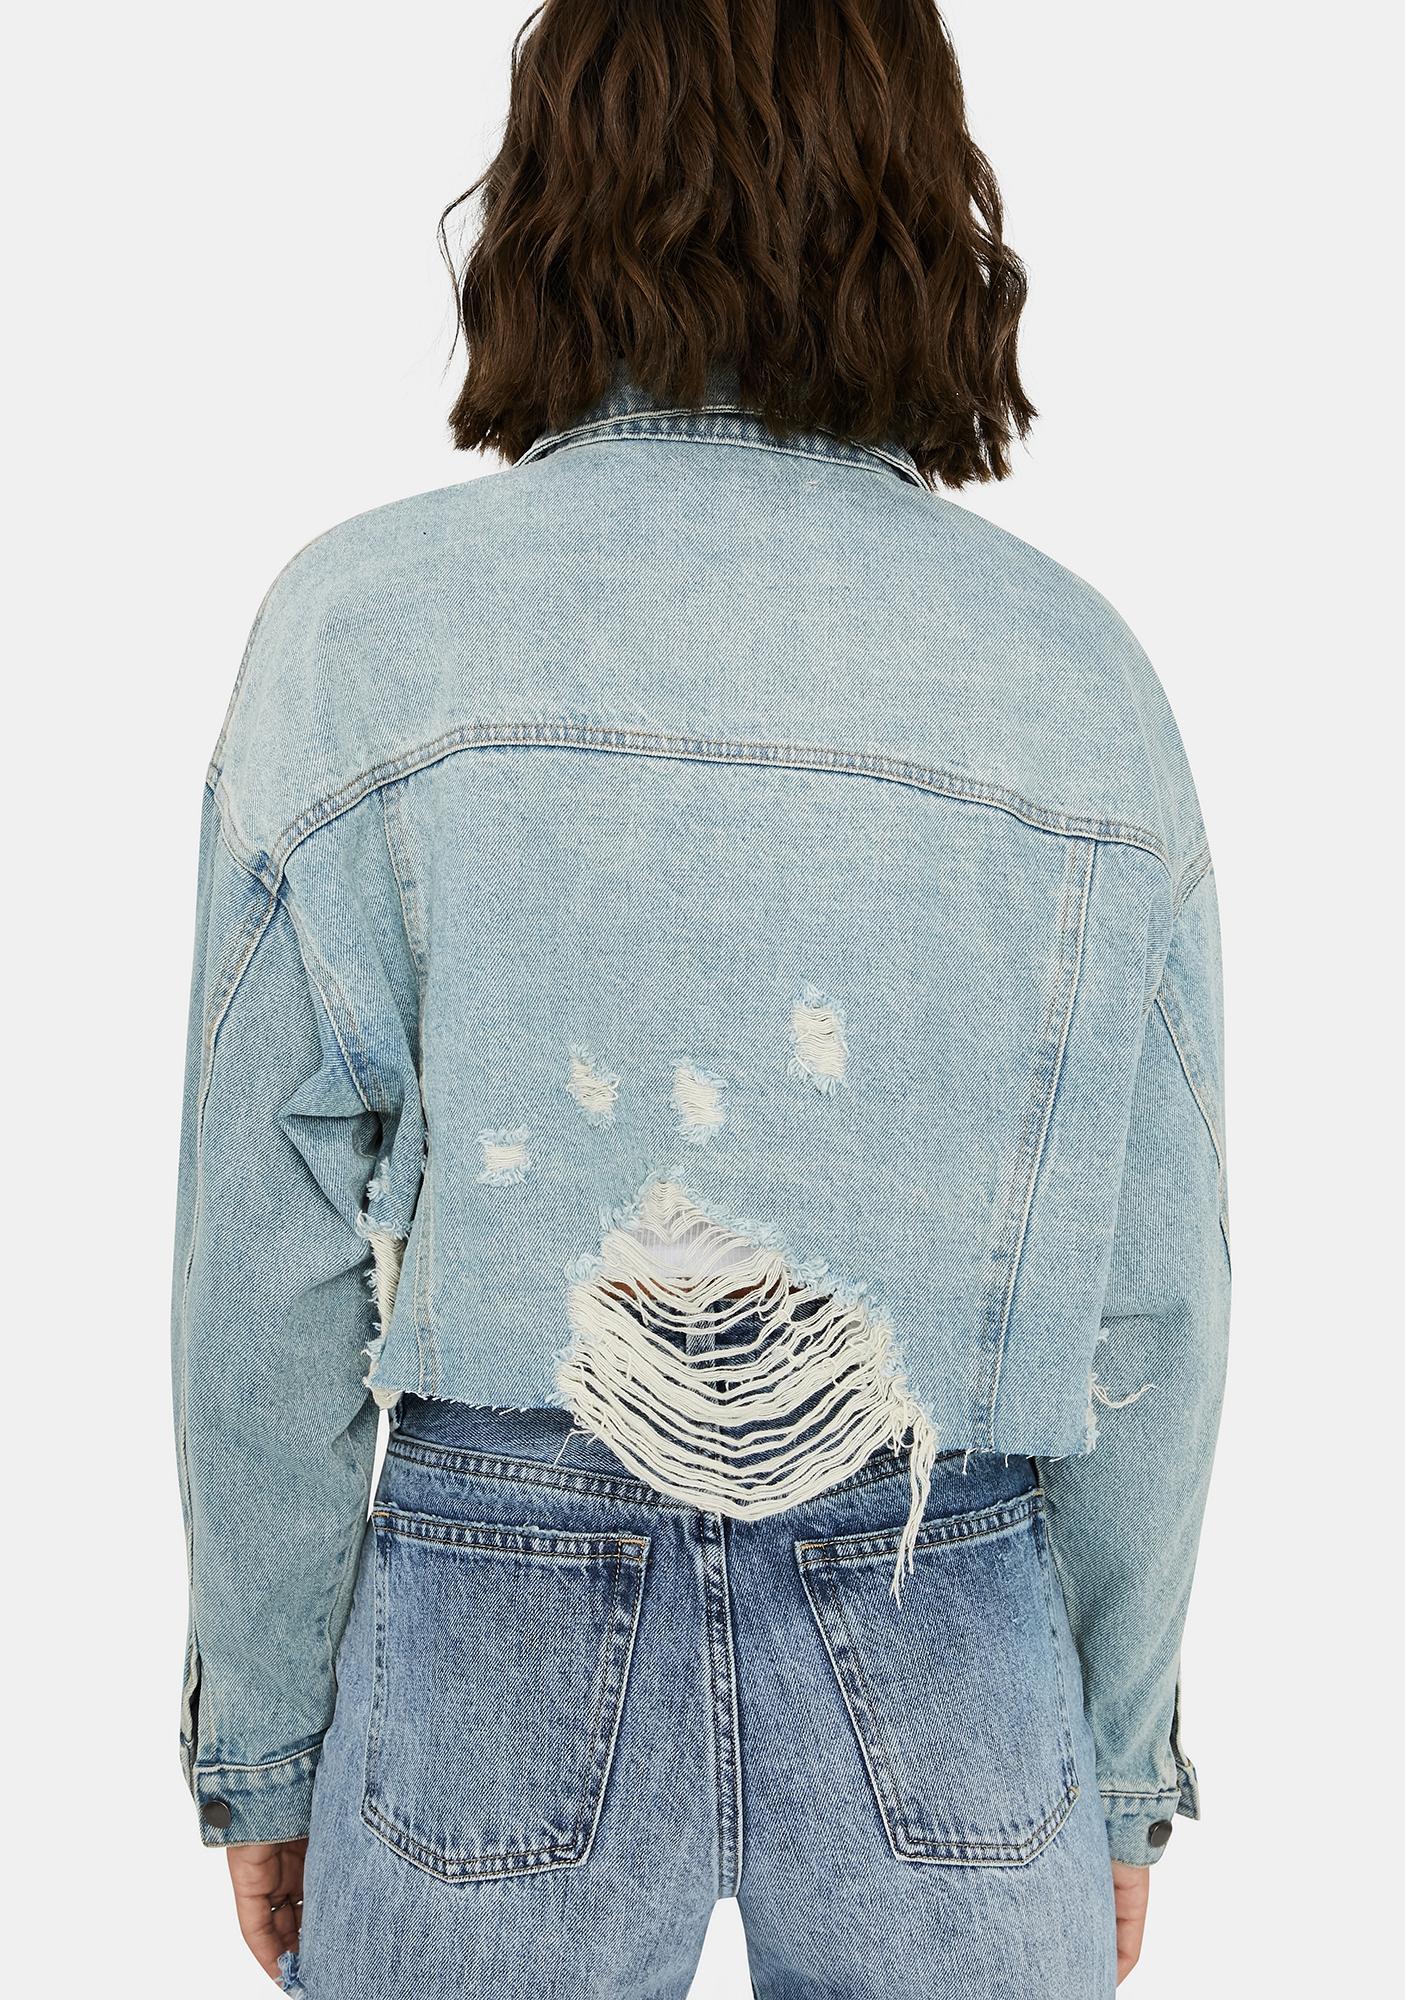 Play It Cool Distressed Denim Jacket